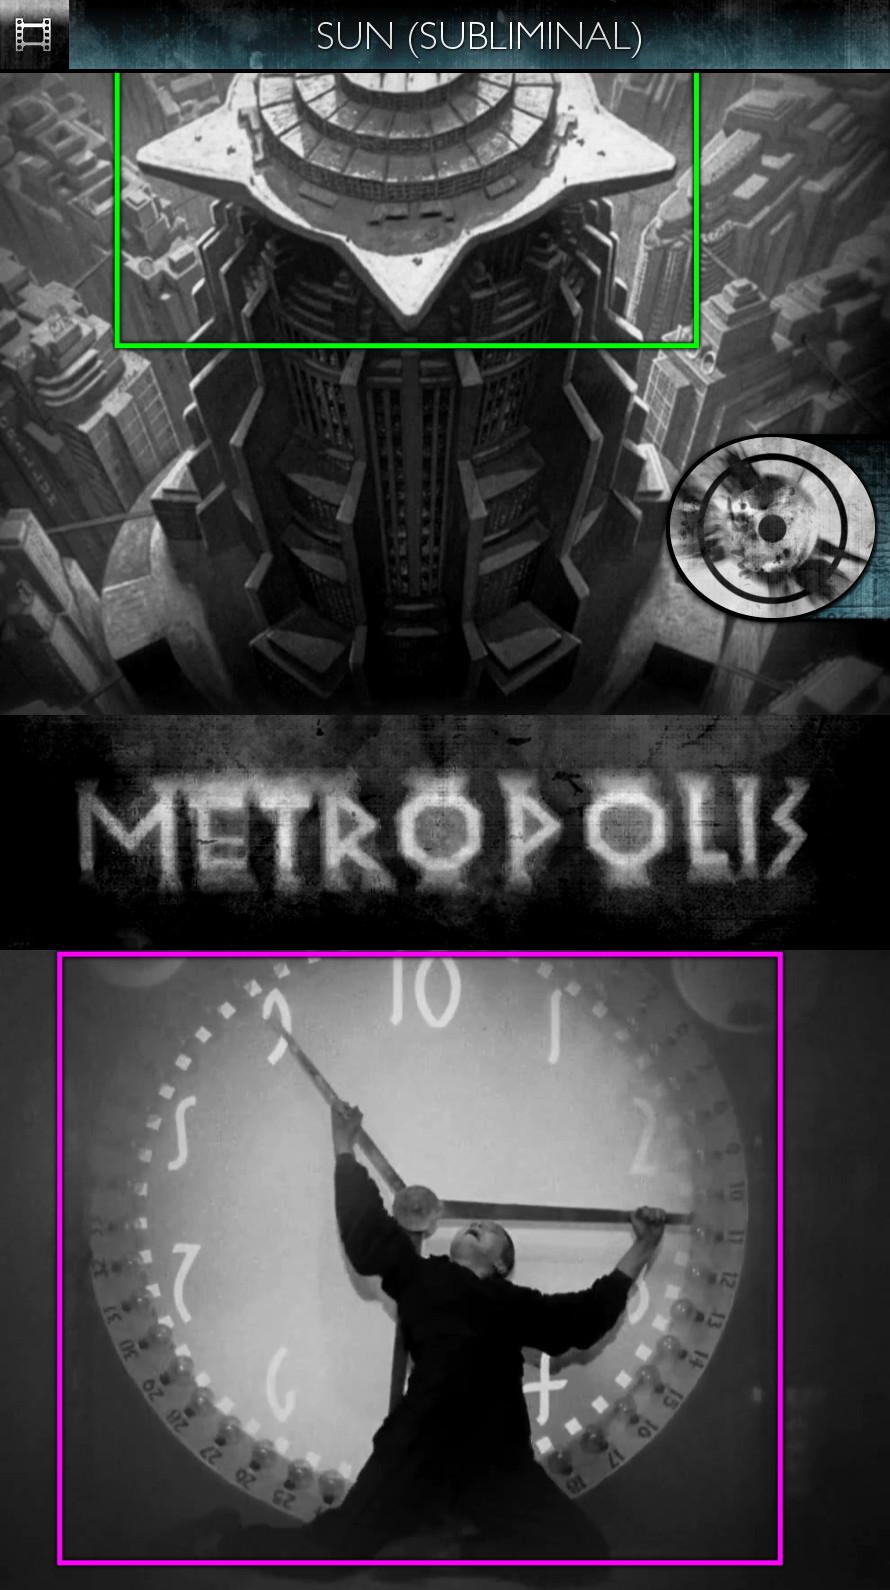 Metropolis (1927) - Sun/Solar - Subliminal